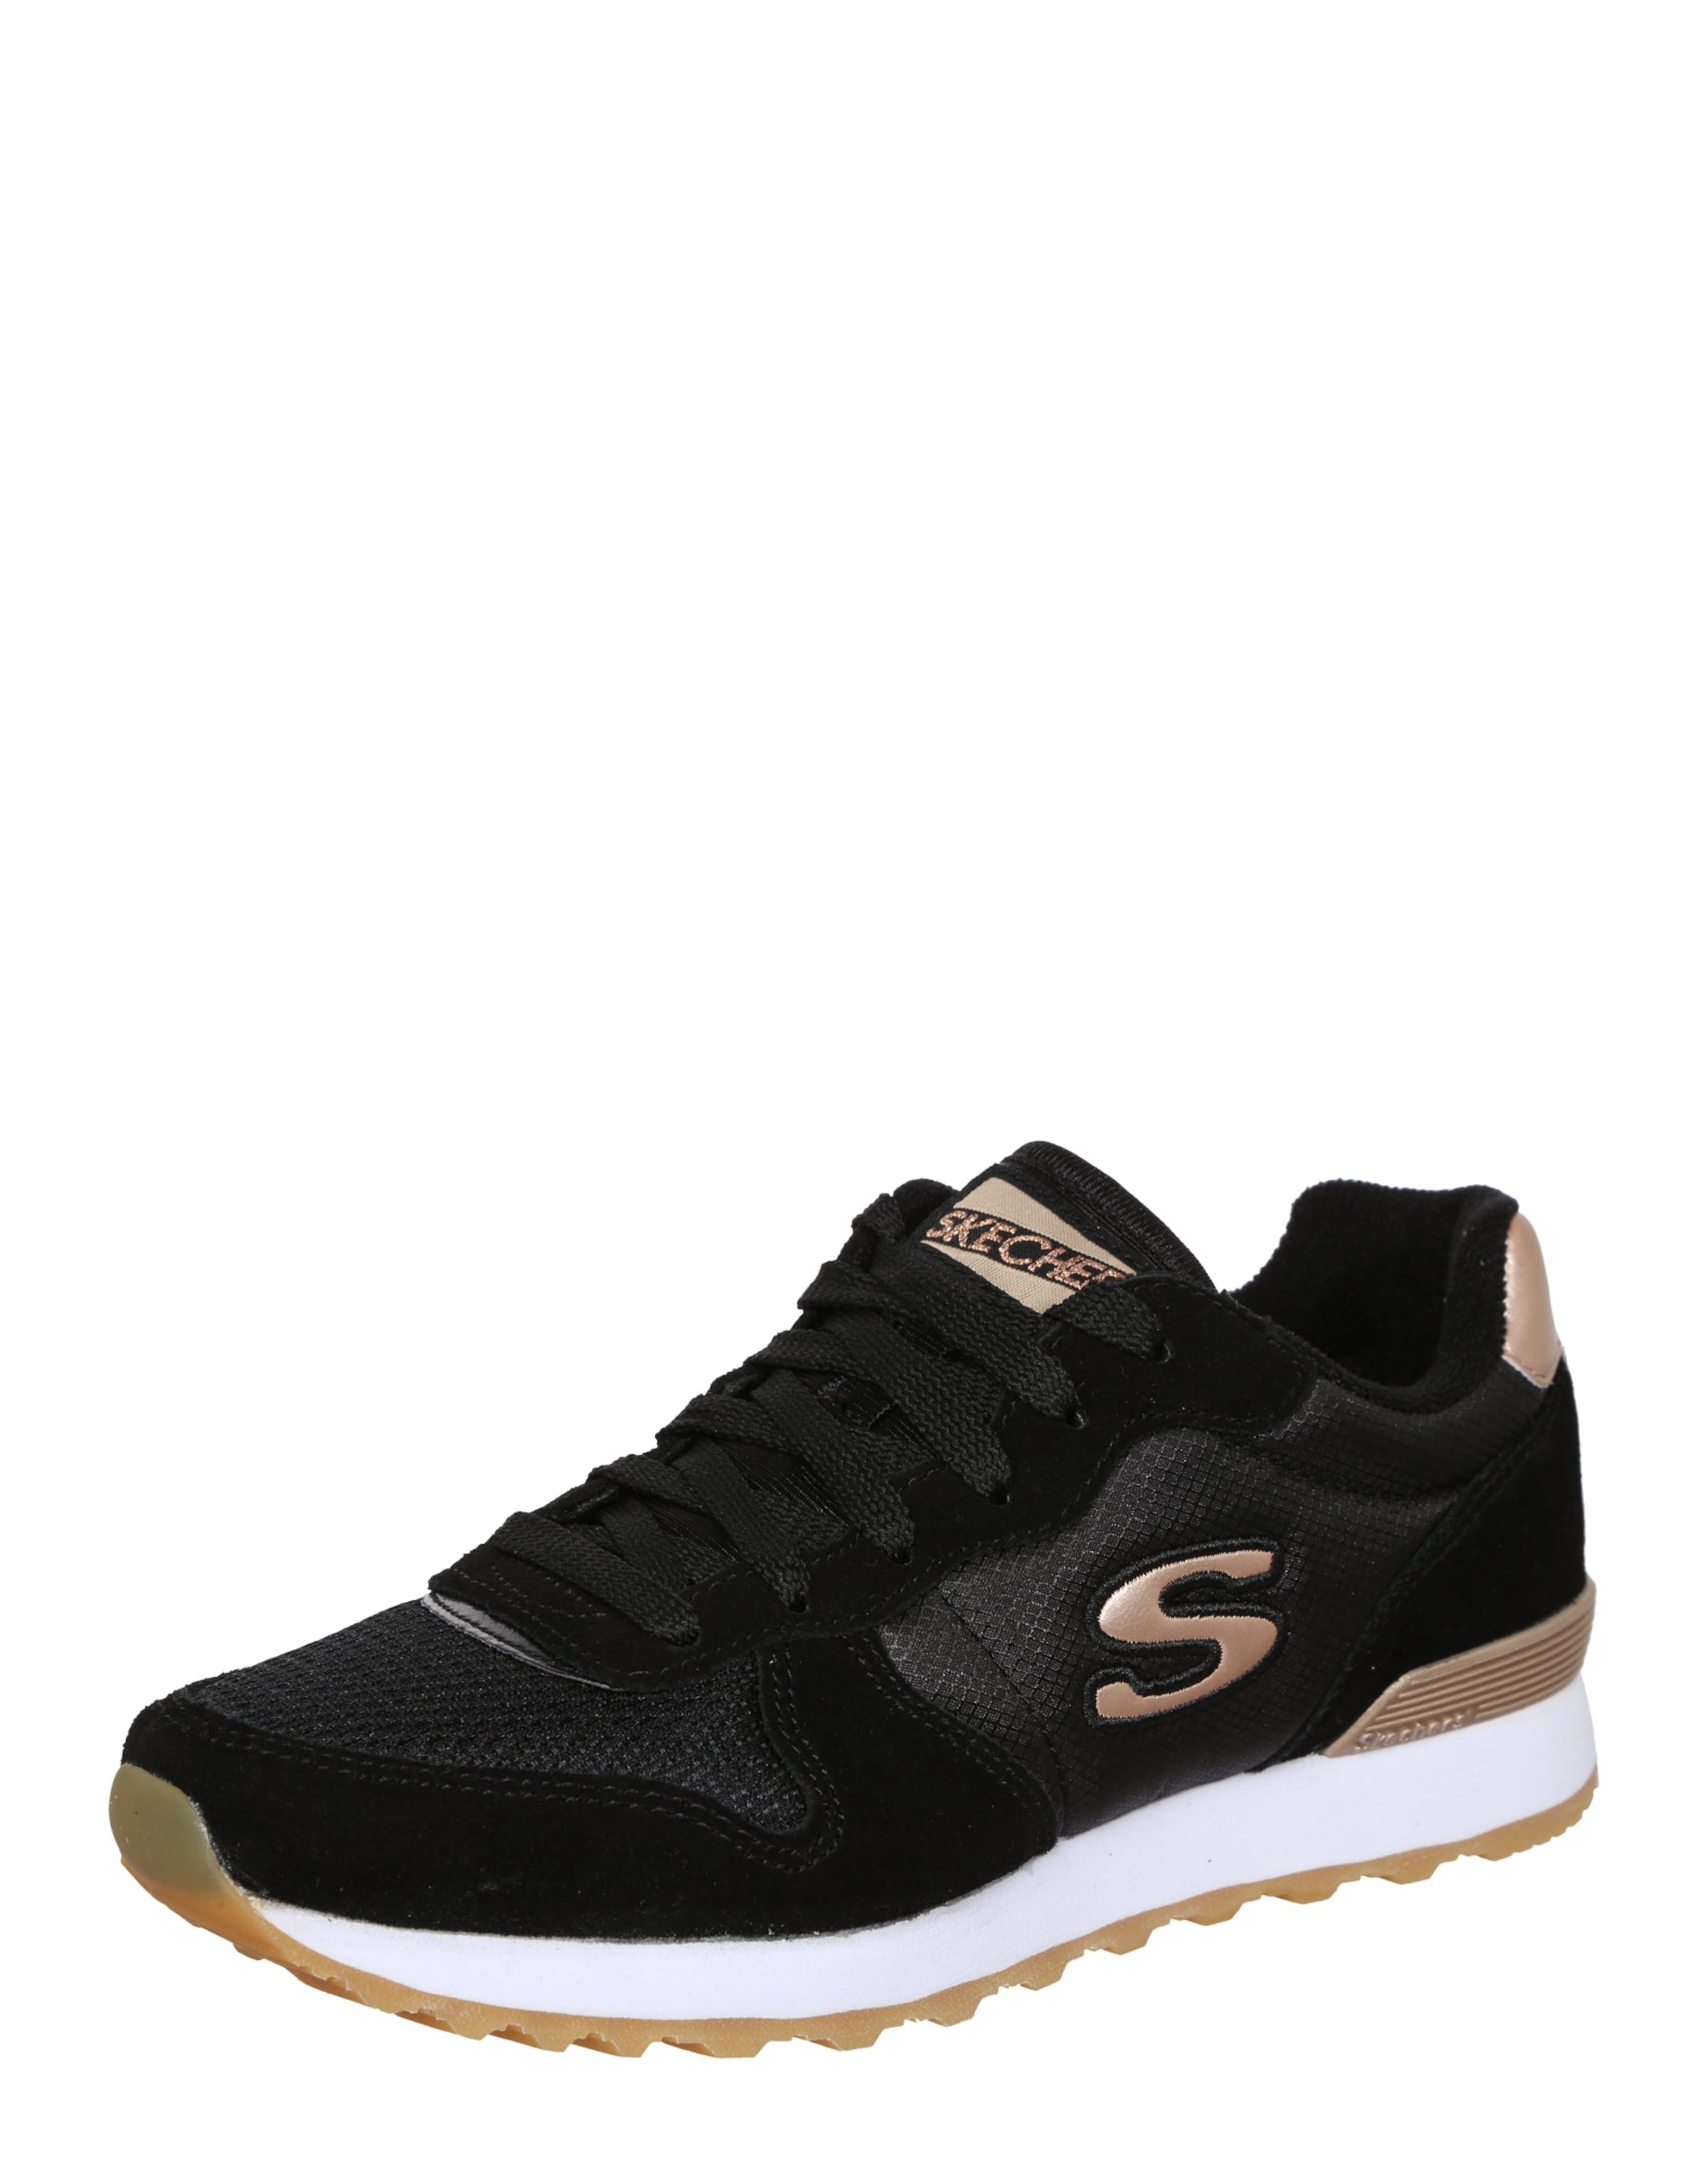 SKECHERS Sneaker Low Goldn gurl Hohe Qualität